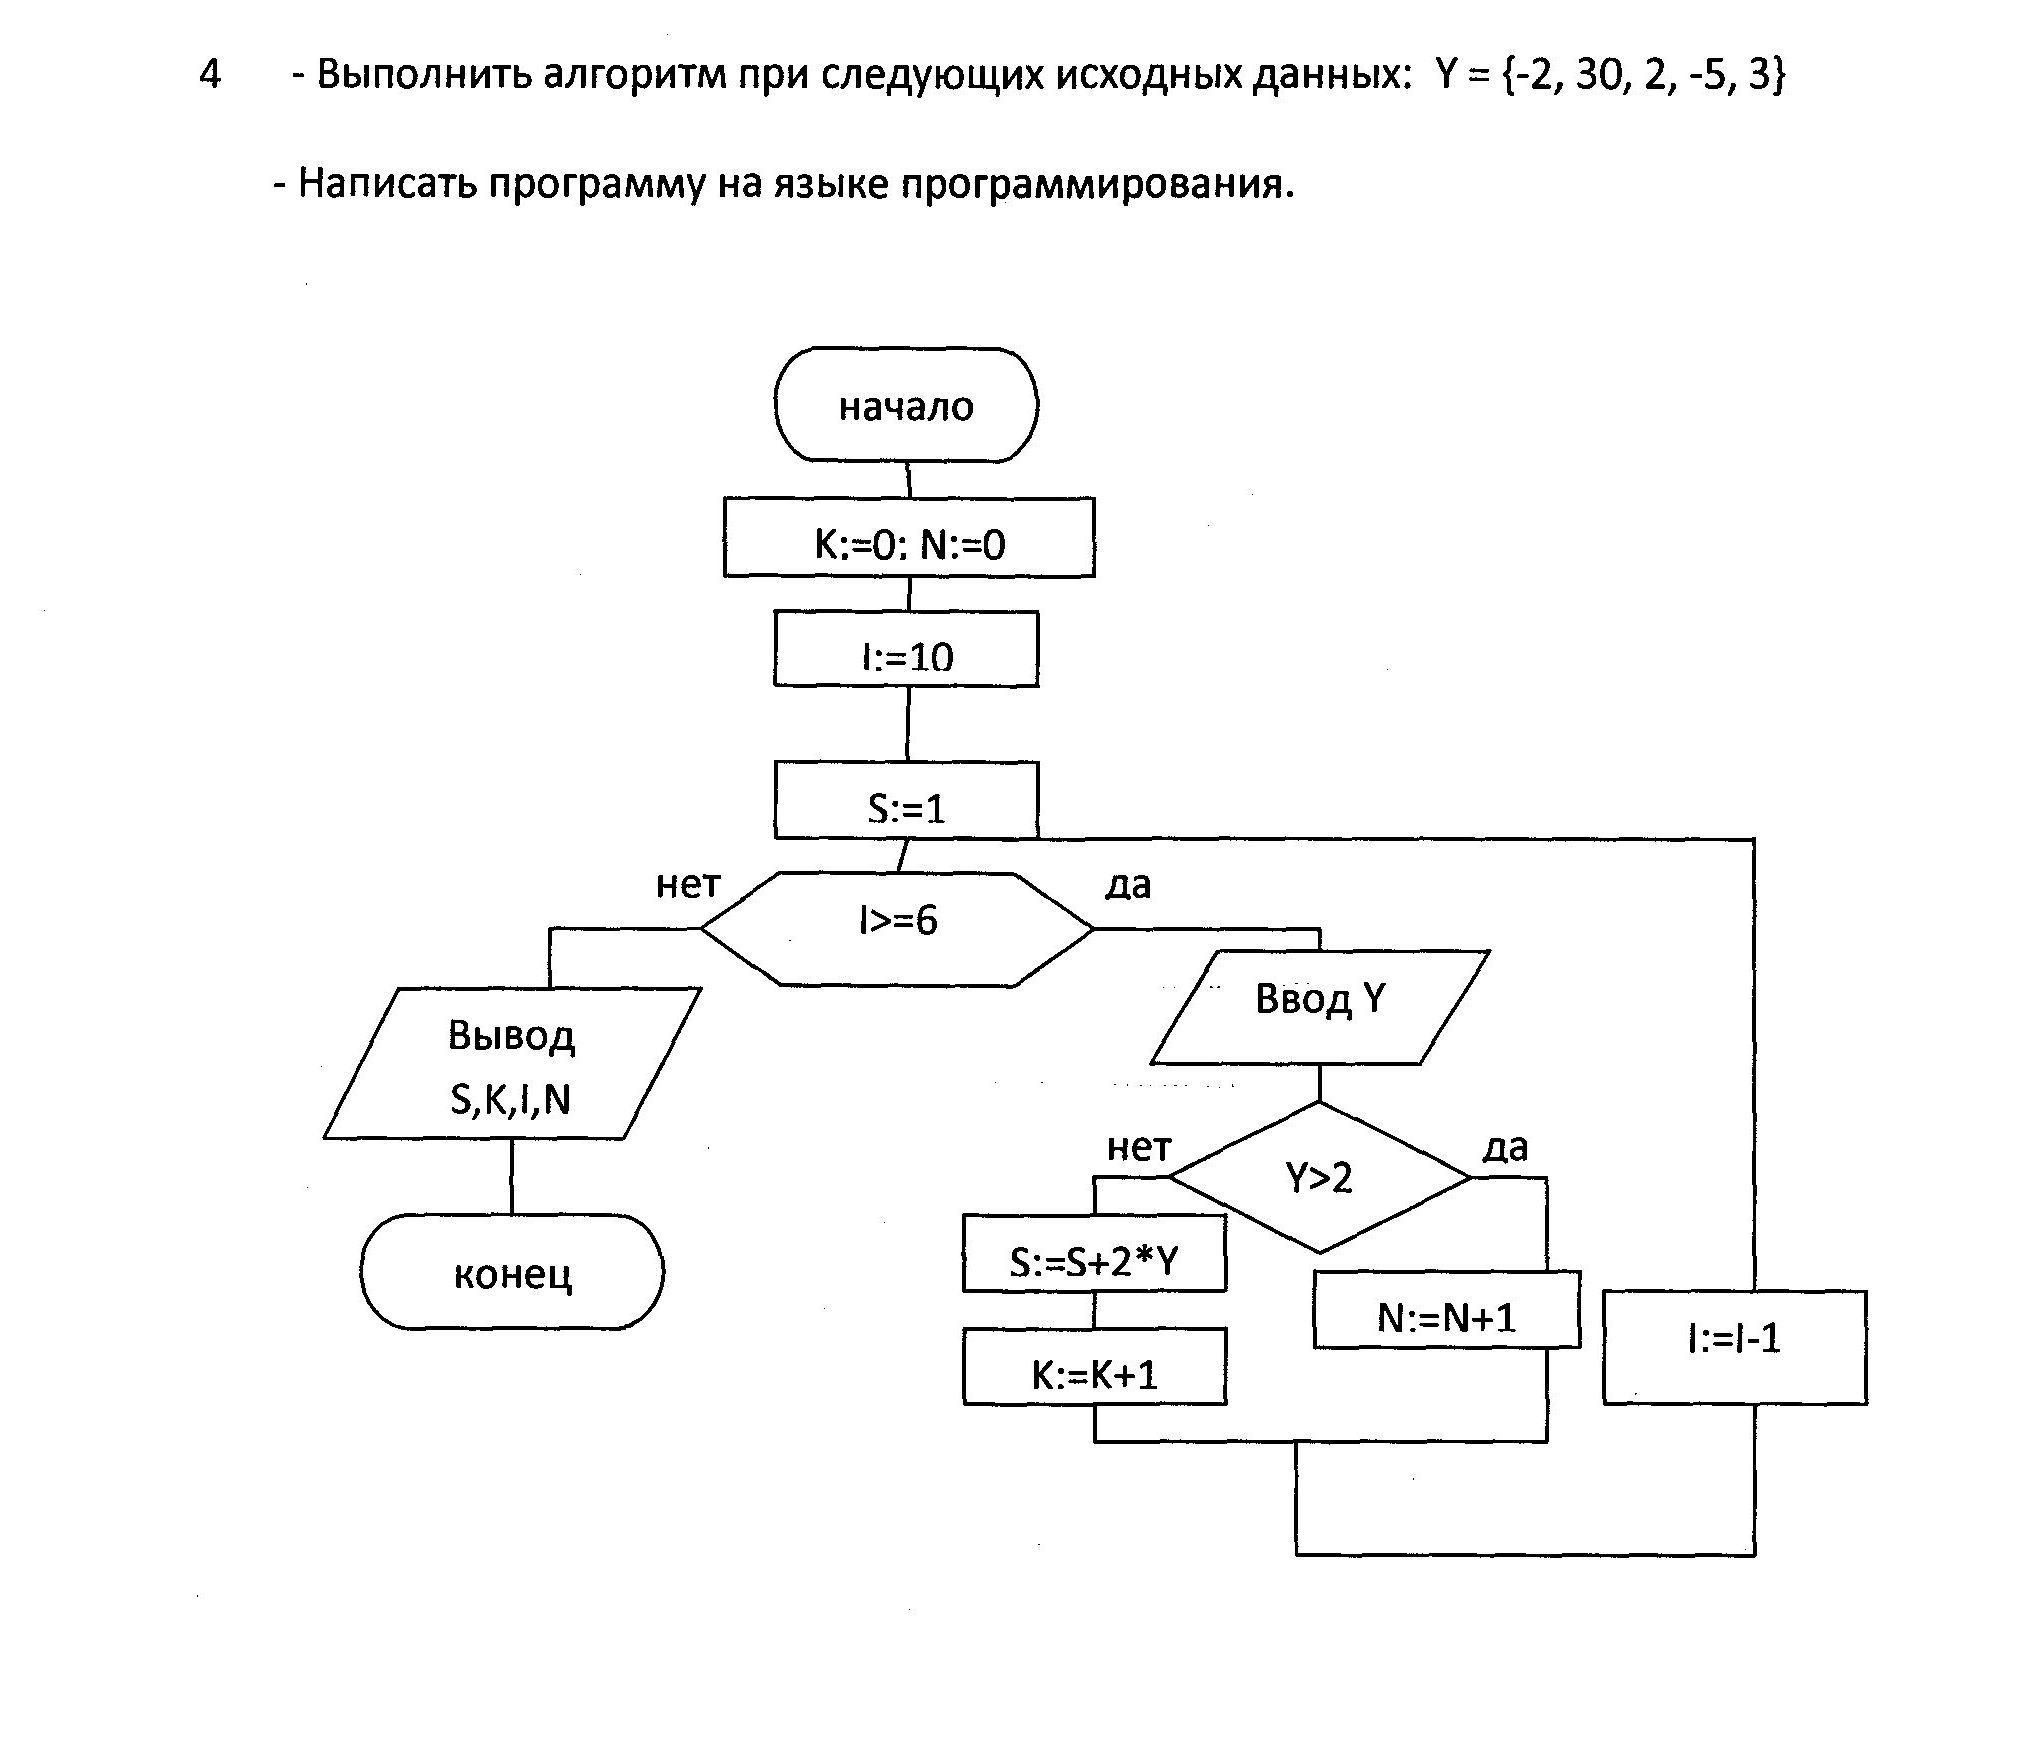 Блок схема алгоритма примеры информатика фото 681